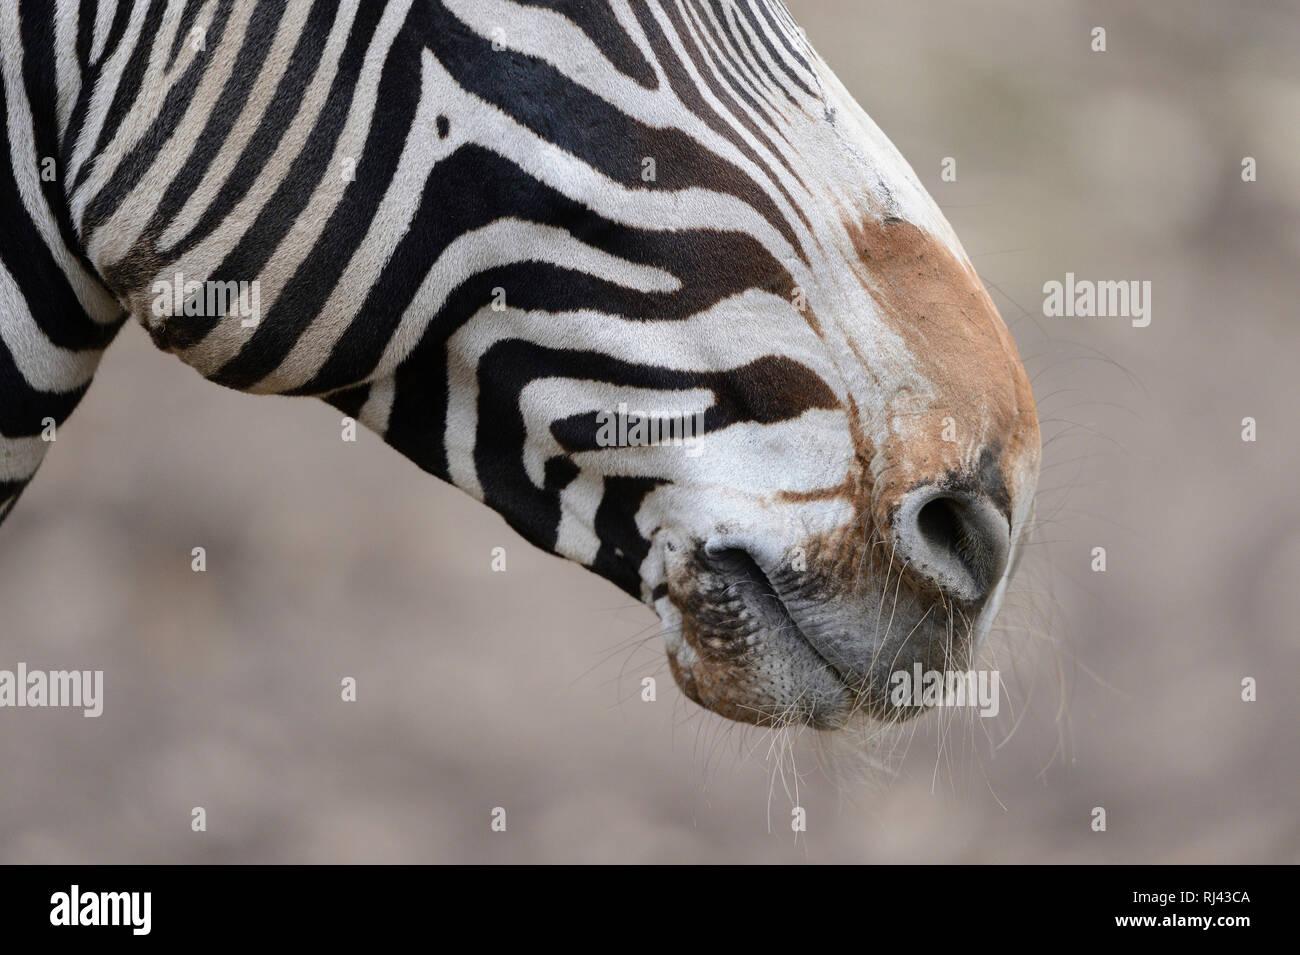 Bergzebra, Equus Zebra, Detail, Nase, Stock Photo